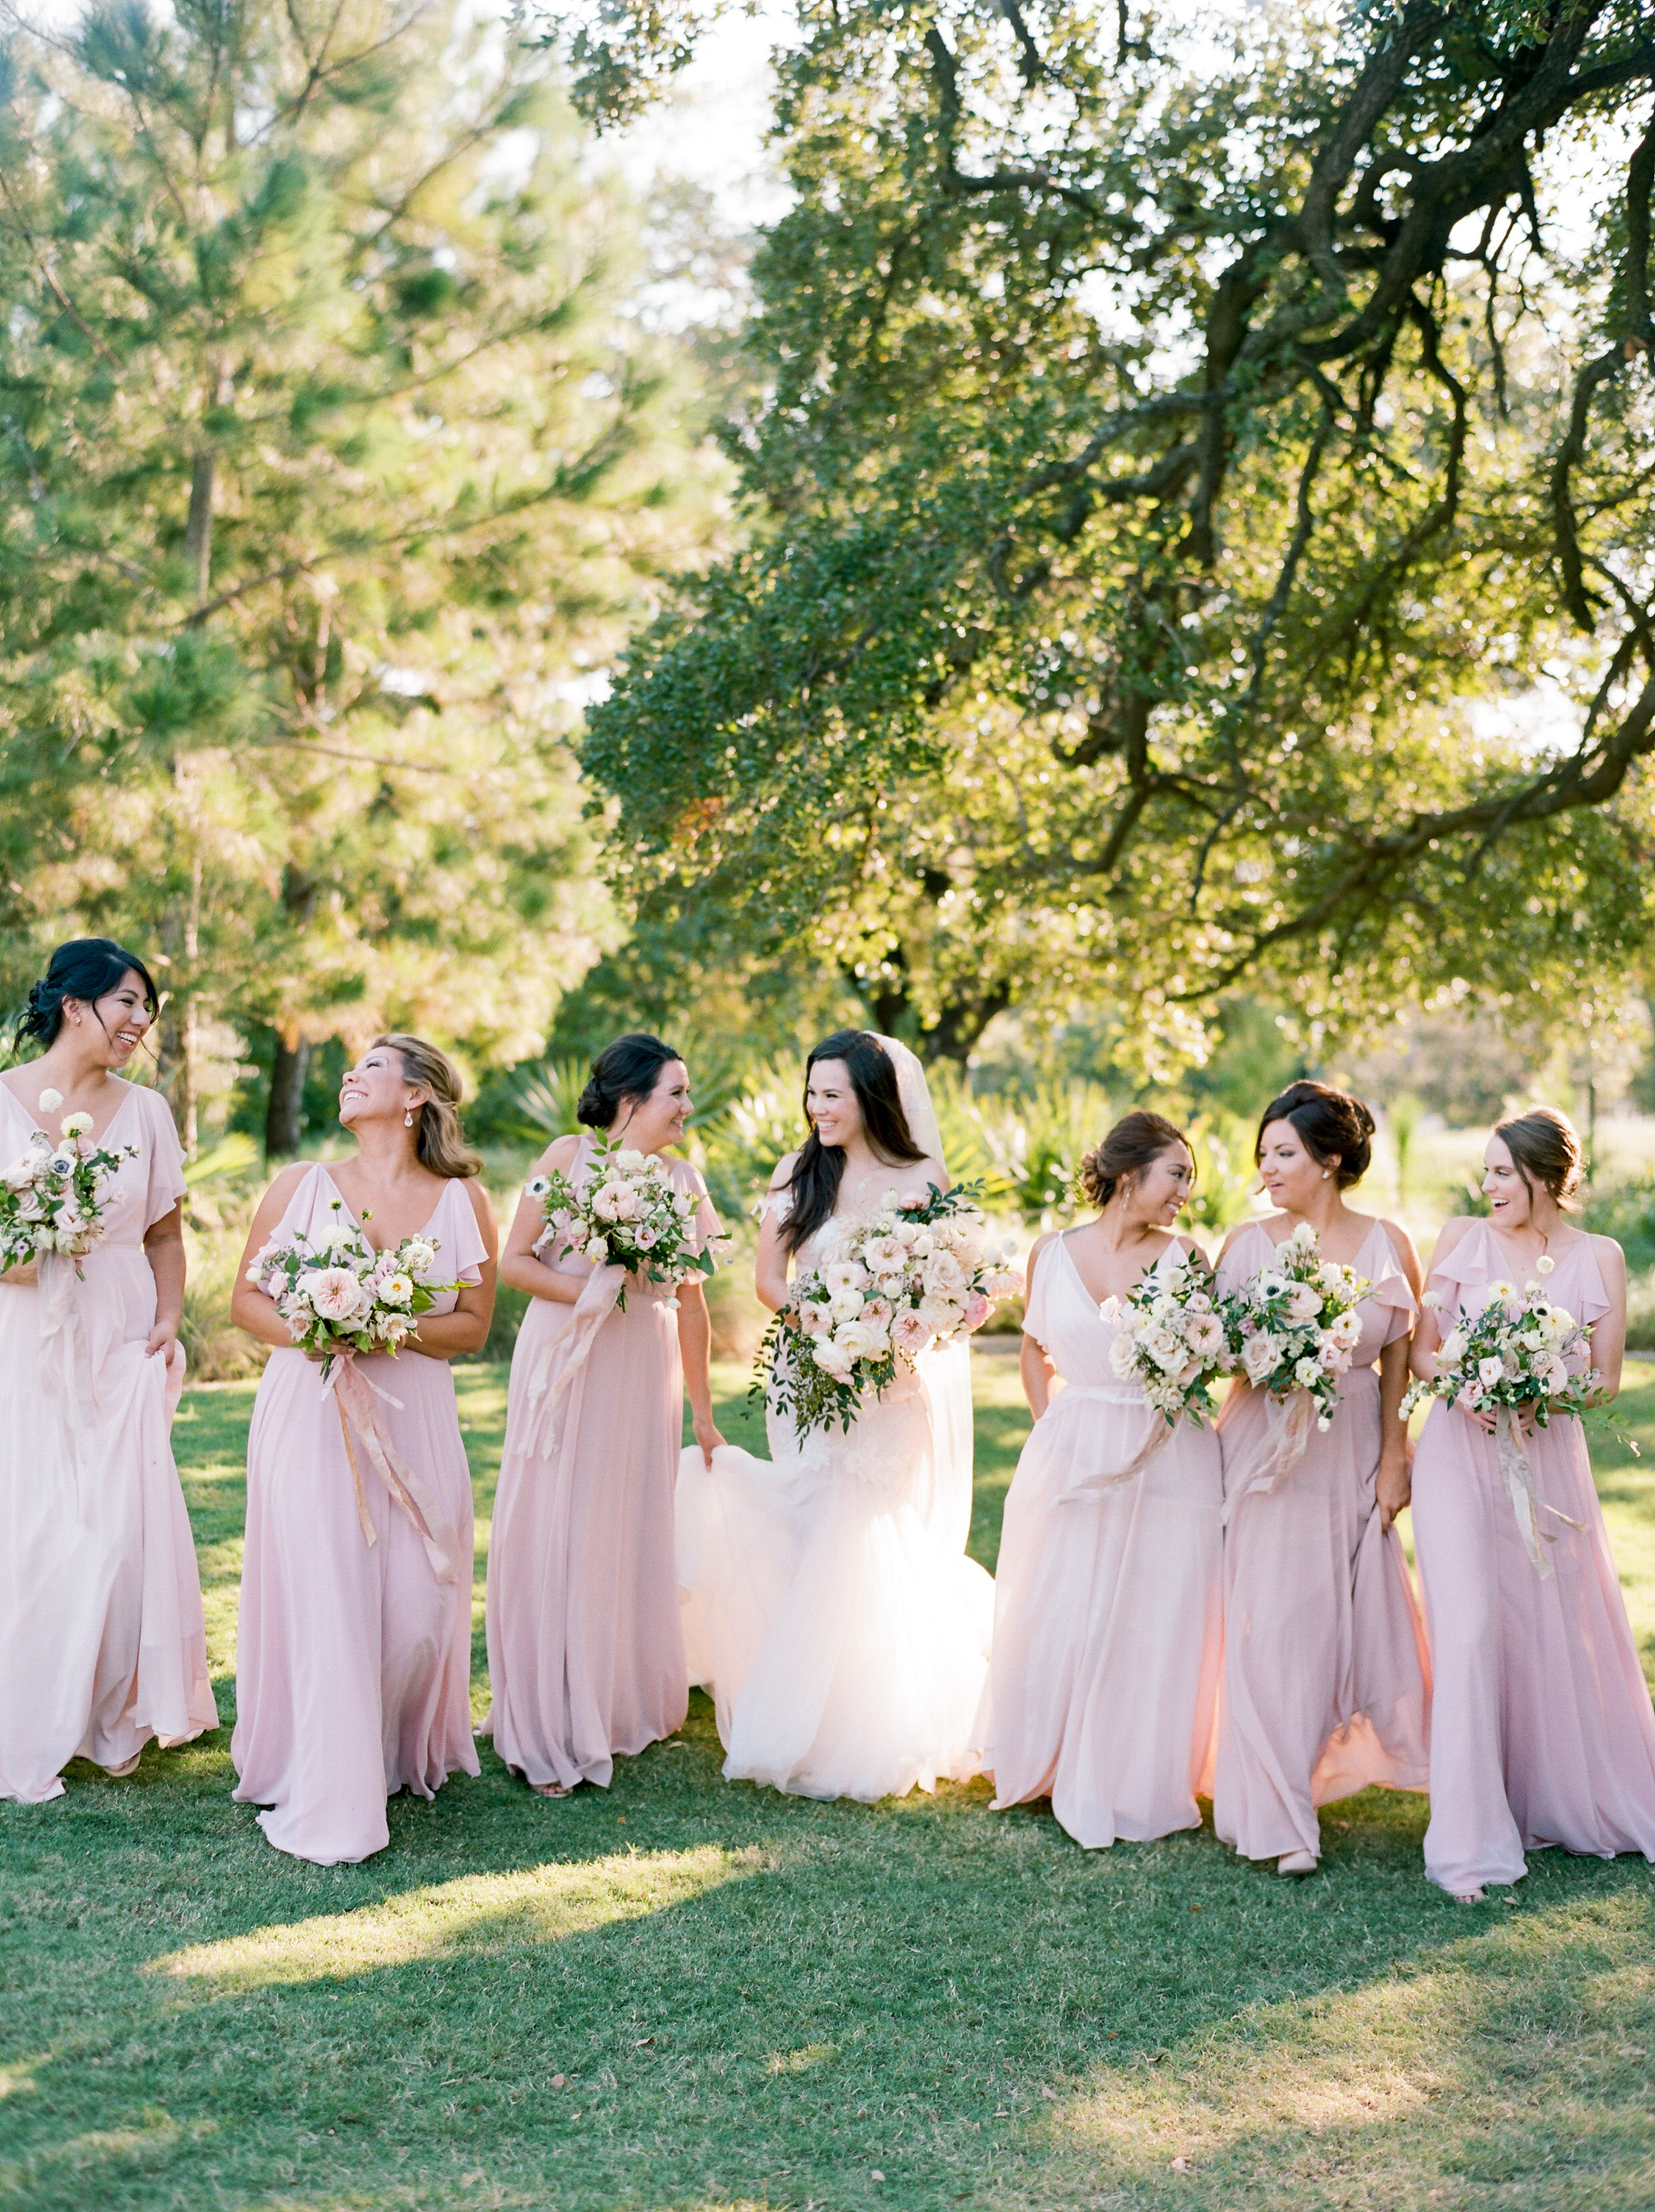 Martha-Stewart-Wedding-Dana-Fernandez-Photography-Josh-Texas-Film-Houston-Wedding-Fine-Art-Photographer-McGovern-Centennial-Gardens-Top-Best-183.jpg